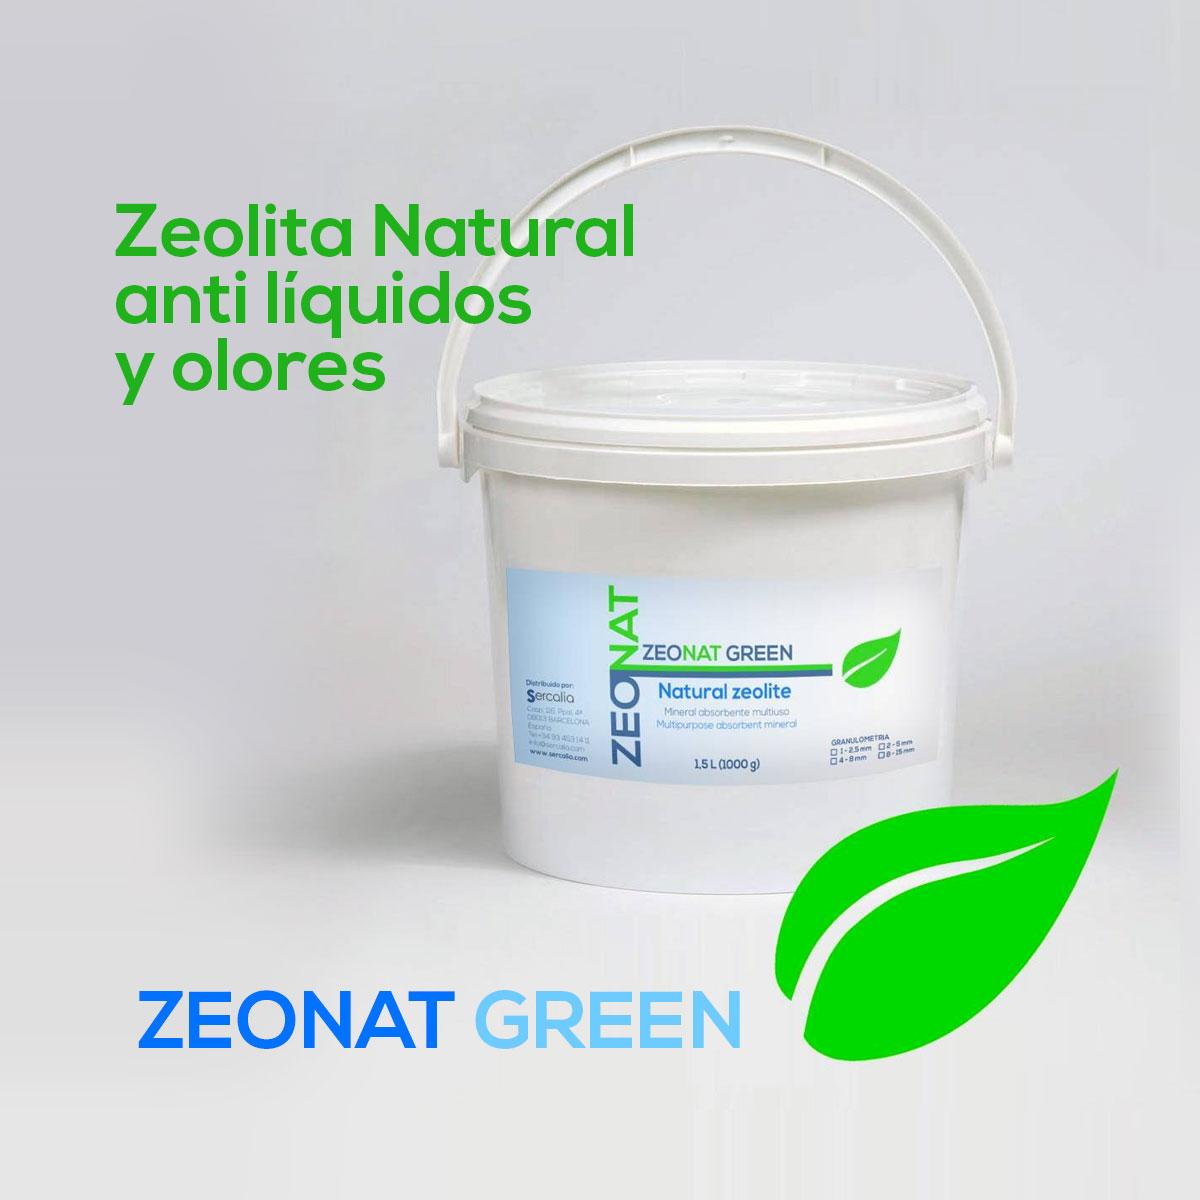 zeolita natural Zeonat Green anti líquidos y olores